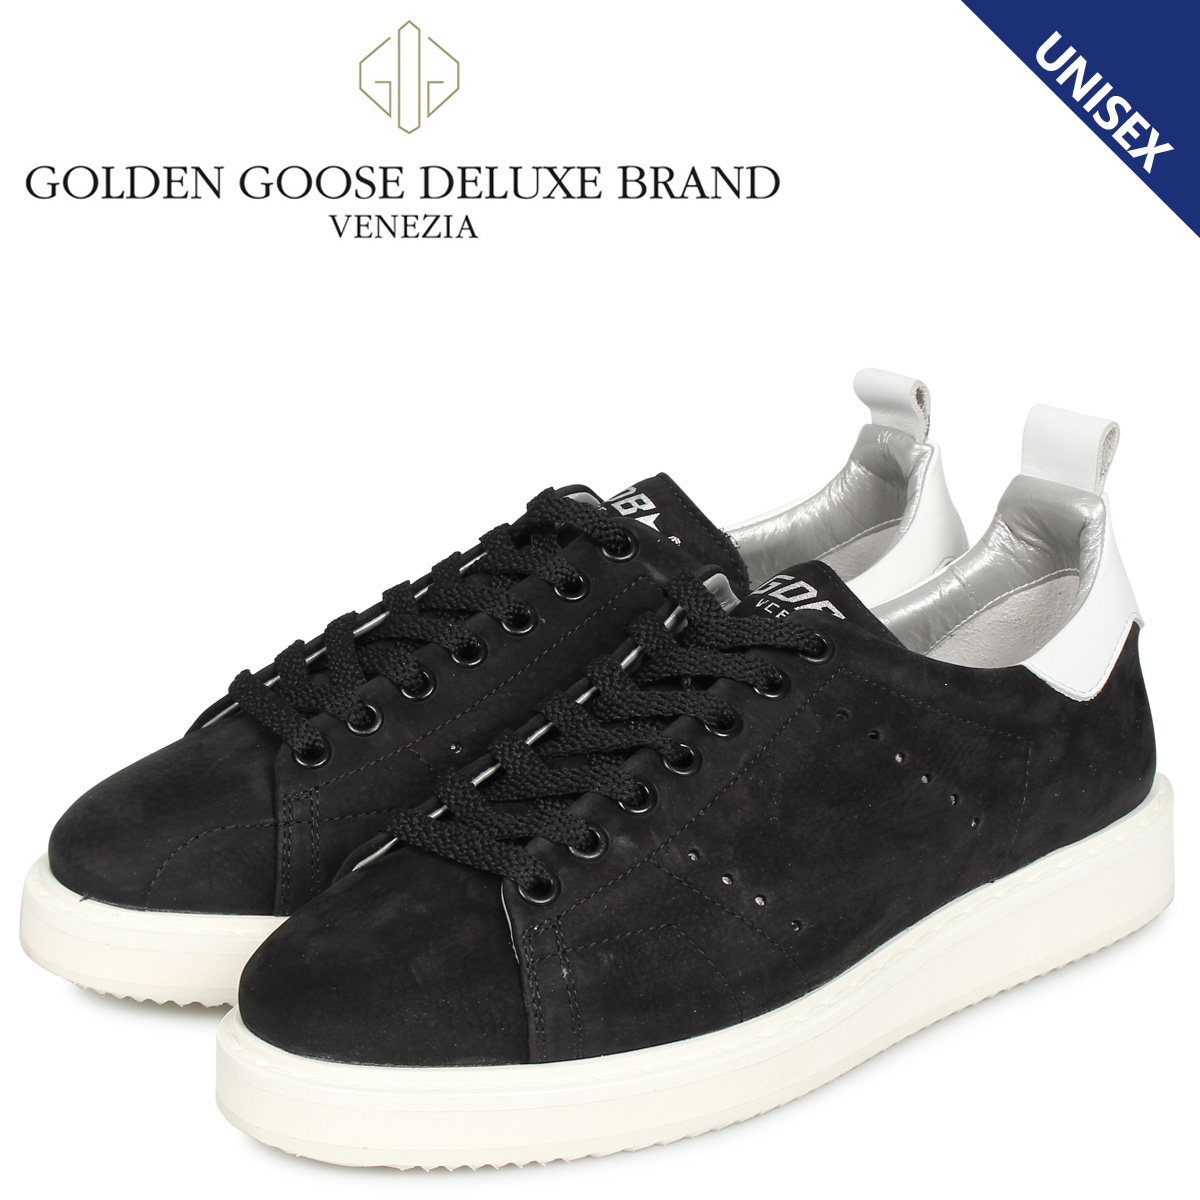 Golden Goose ゴールデングース スターター スニーカー メンズ レディース STARTER ブラック 黒 G35WS631 R1